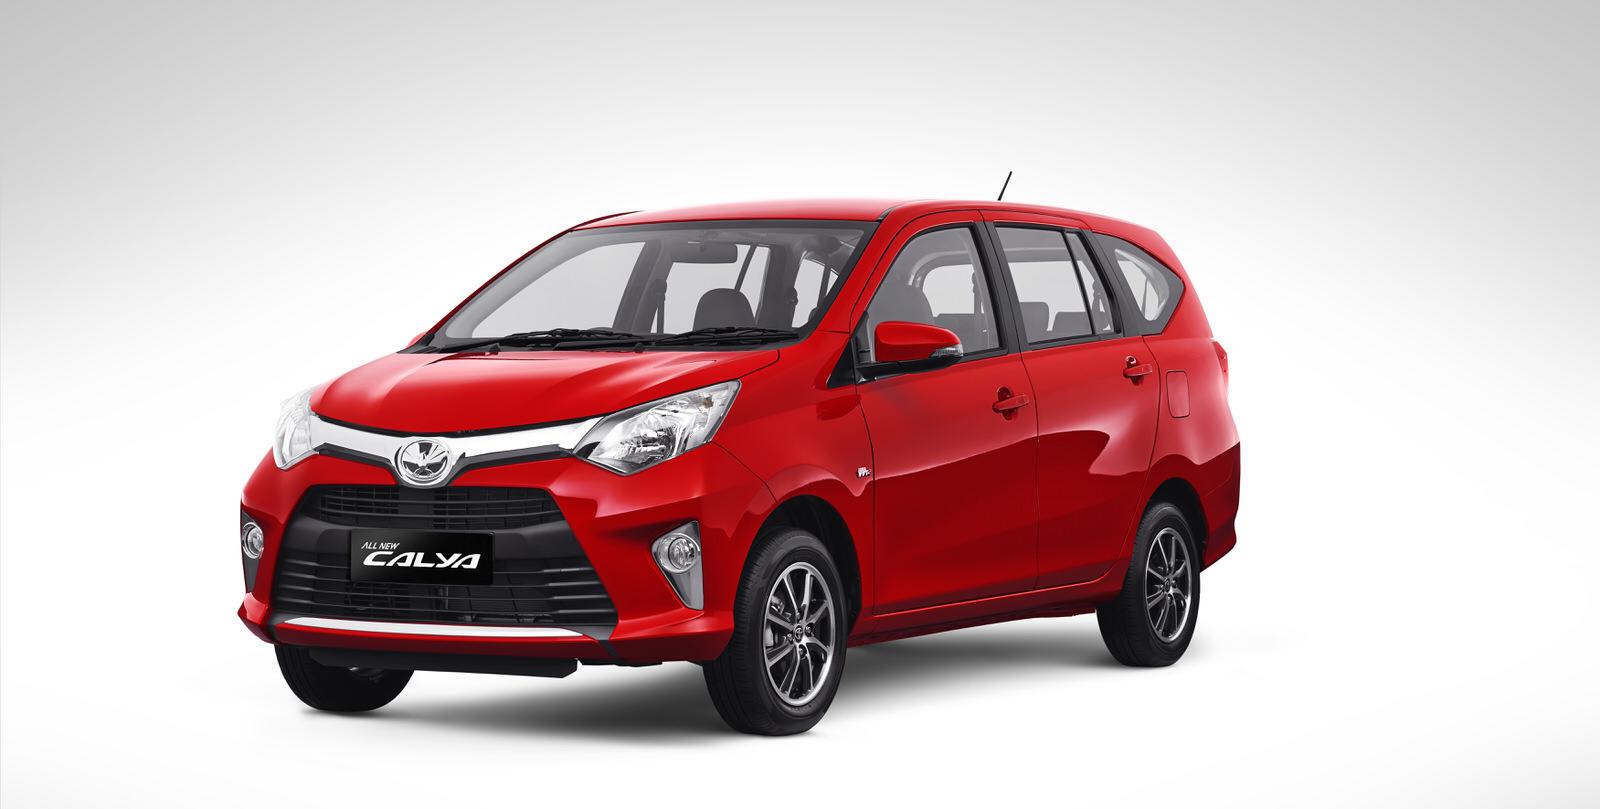 Kelebihan Kekurangan Harga Toyota Calya Harga